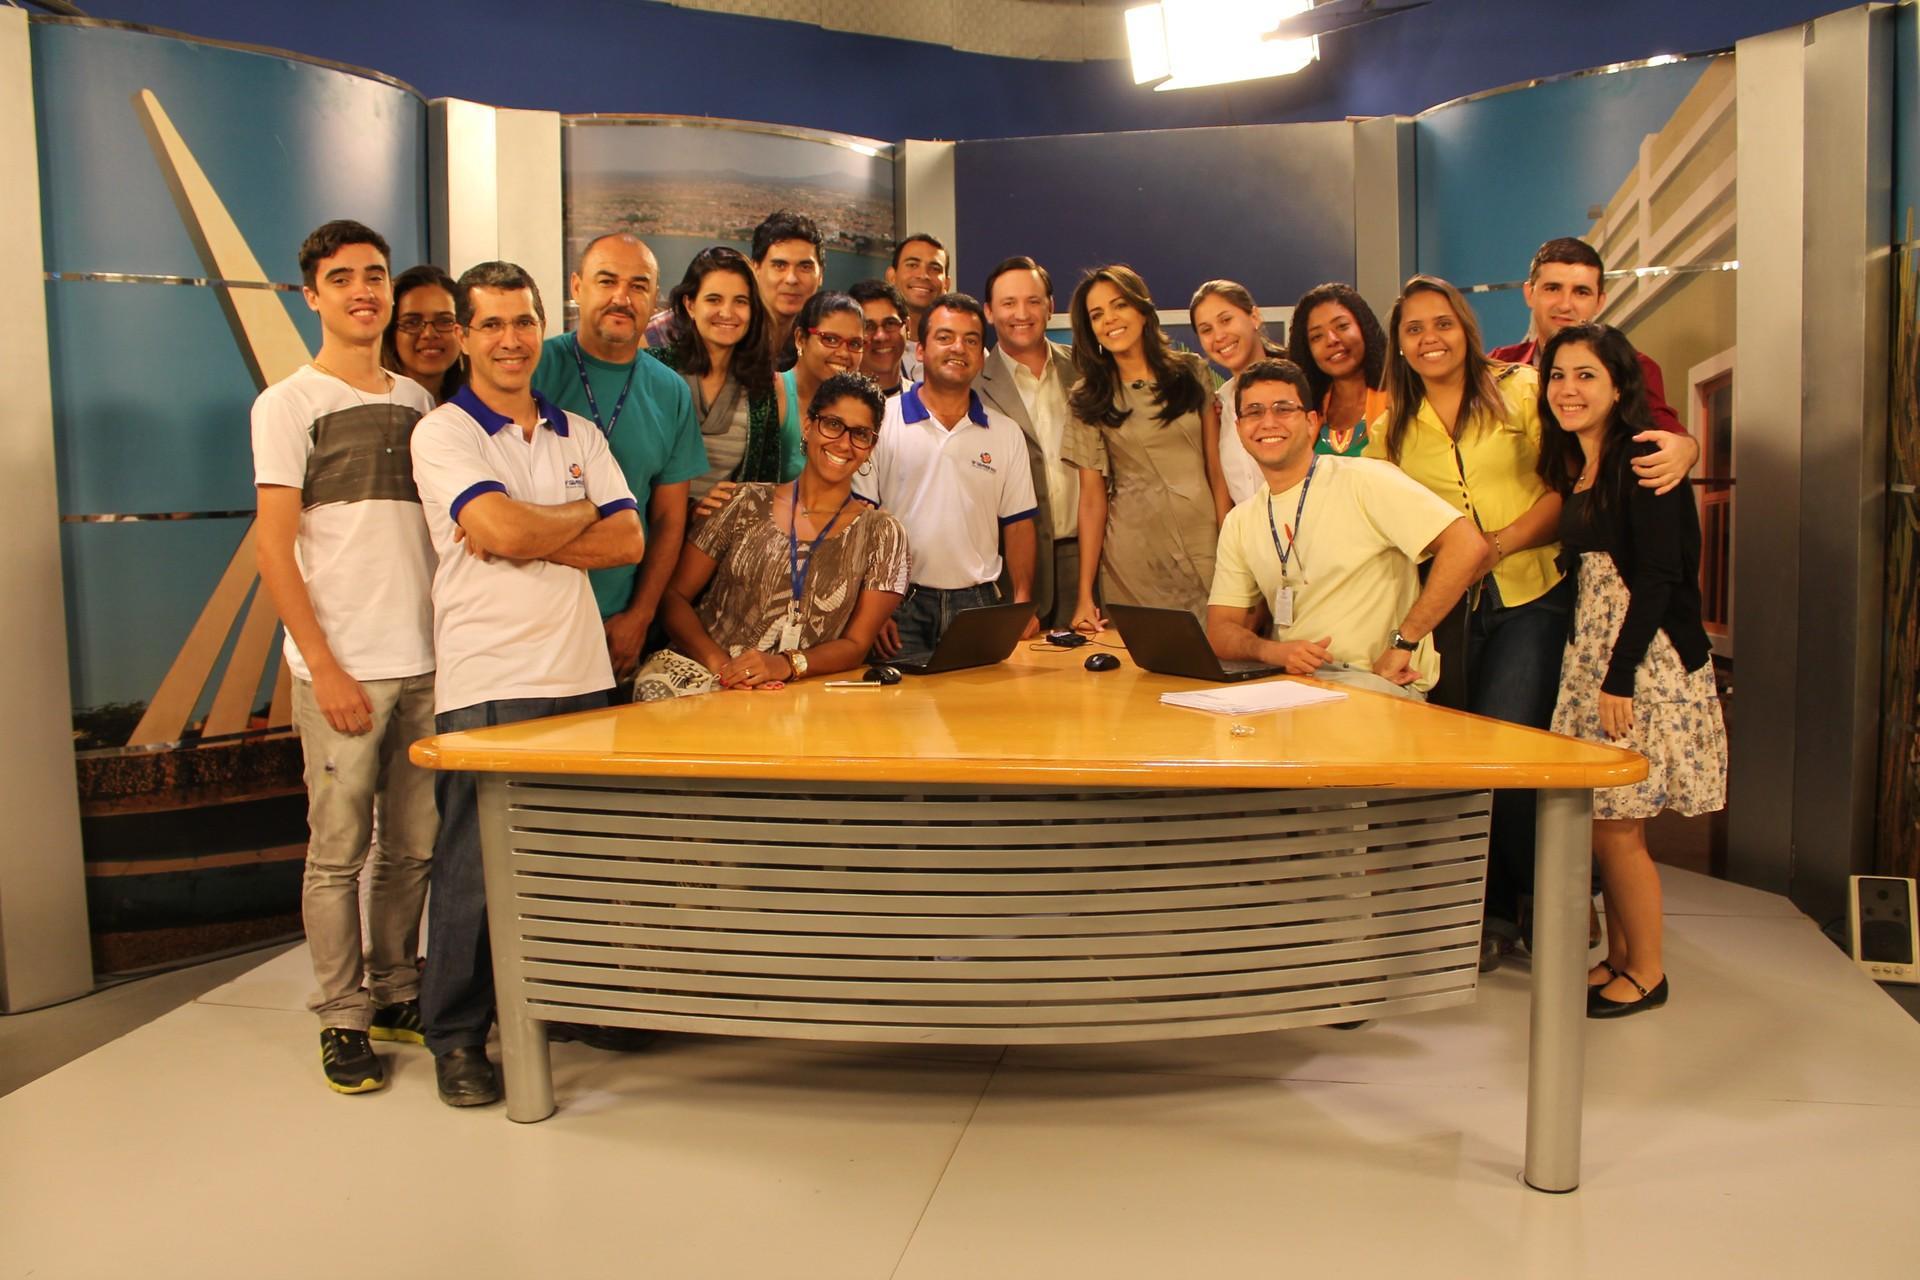 Equipe G1, GE e TV Grande Rio em despedida da jornalista Vilma Oliveira. (Foto: Larissa Paim)